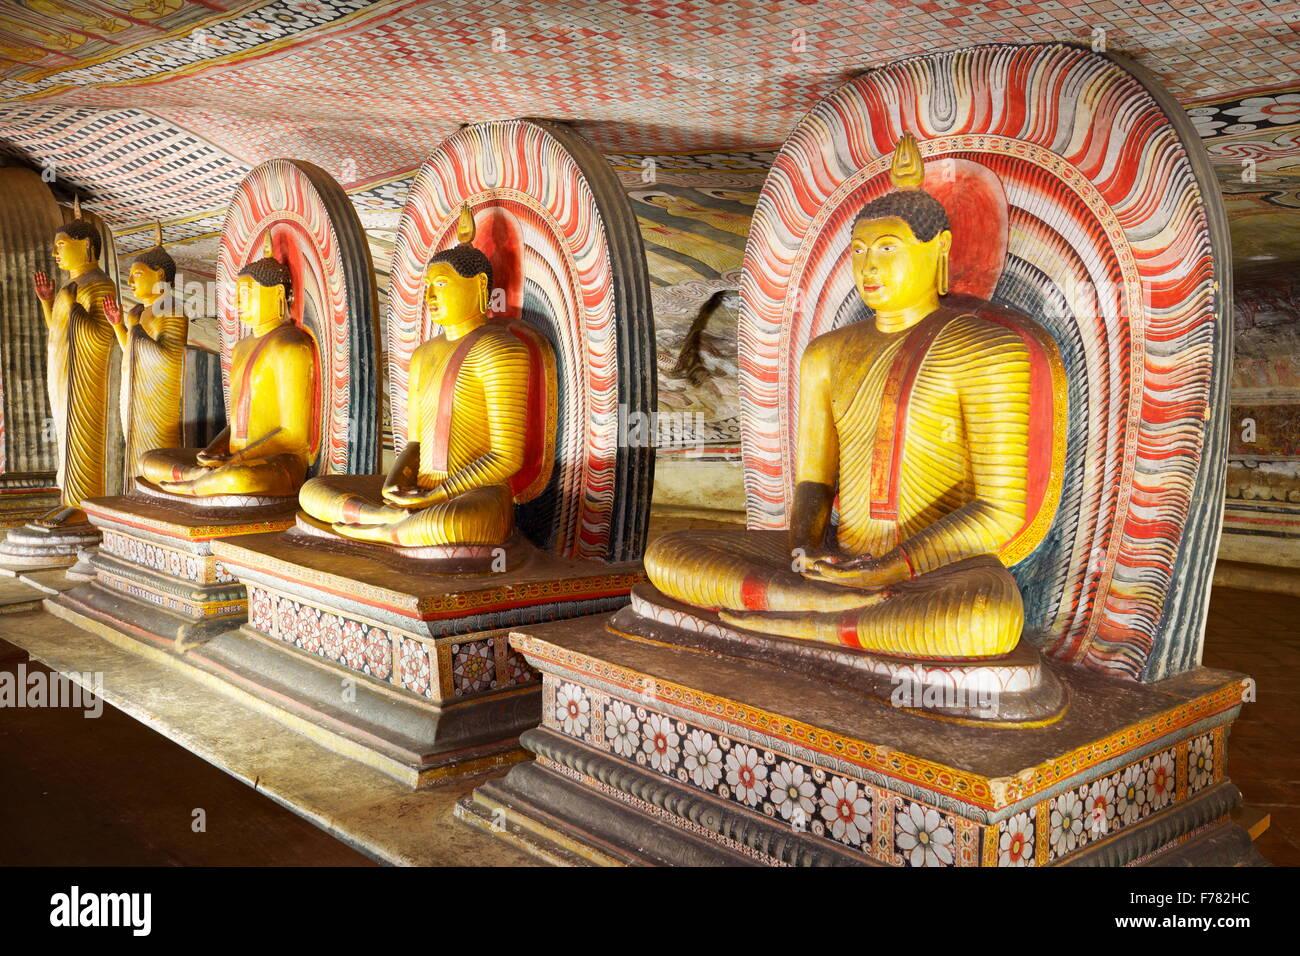 Buddish Cave Temple Dambulla, Sri Lanka, Kandy province, UNESCO World Heritage Site Stock Photo